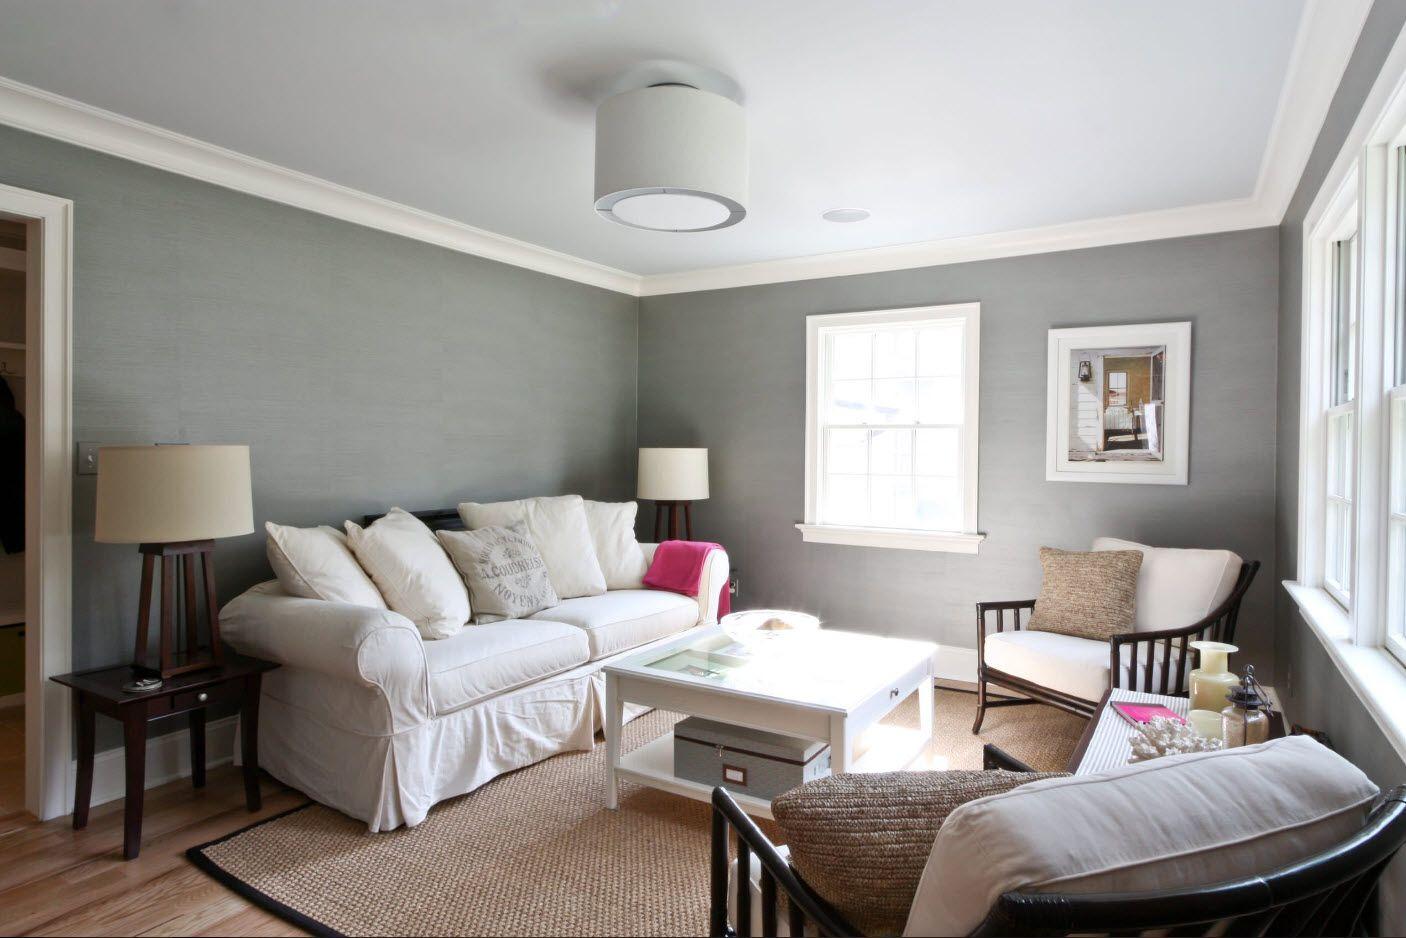 Scandinavian or English interior with gray walls